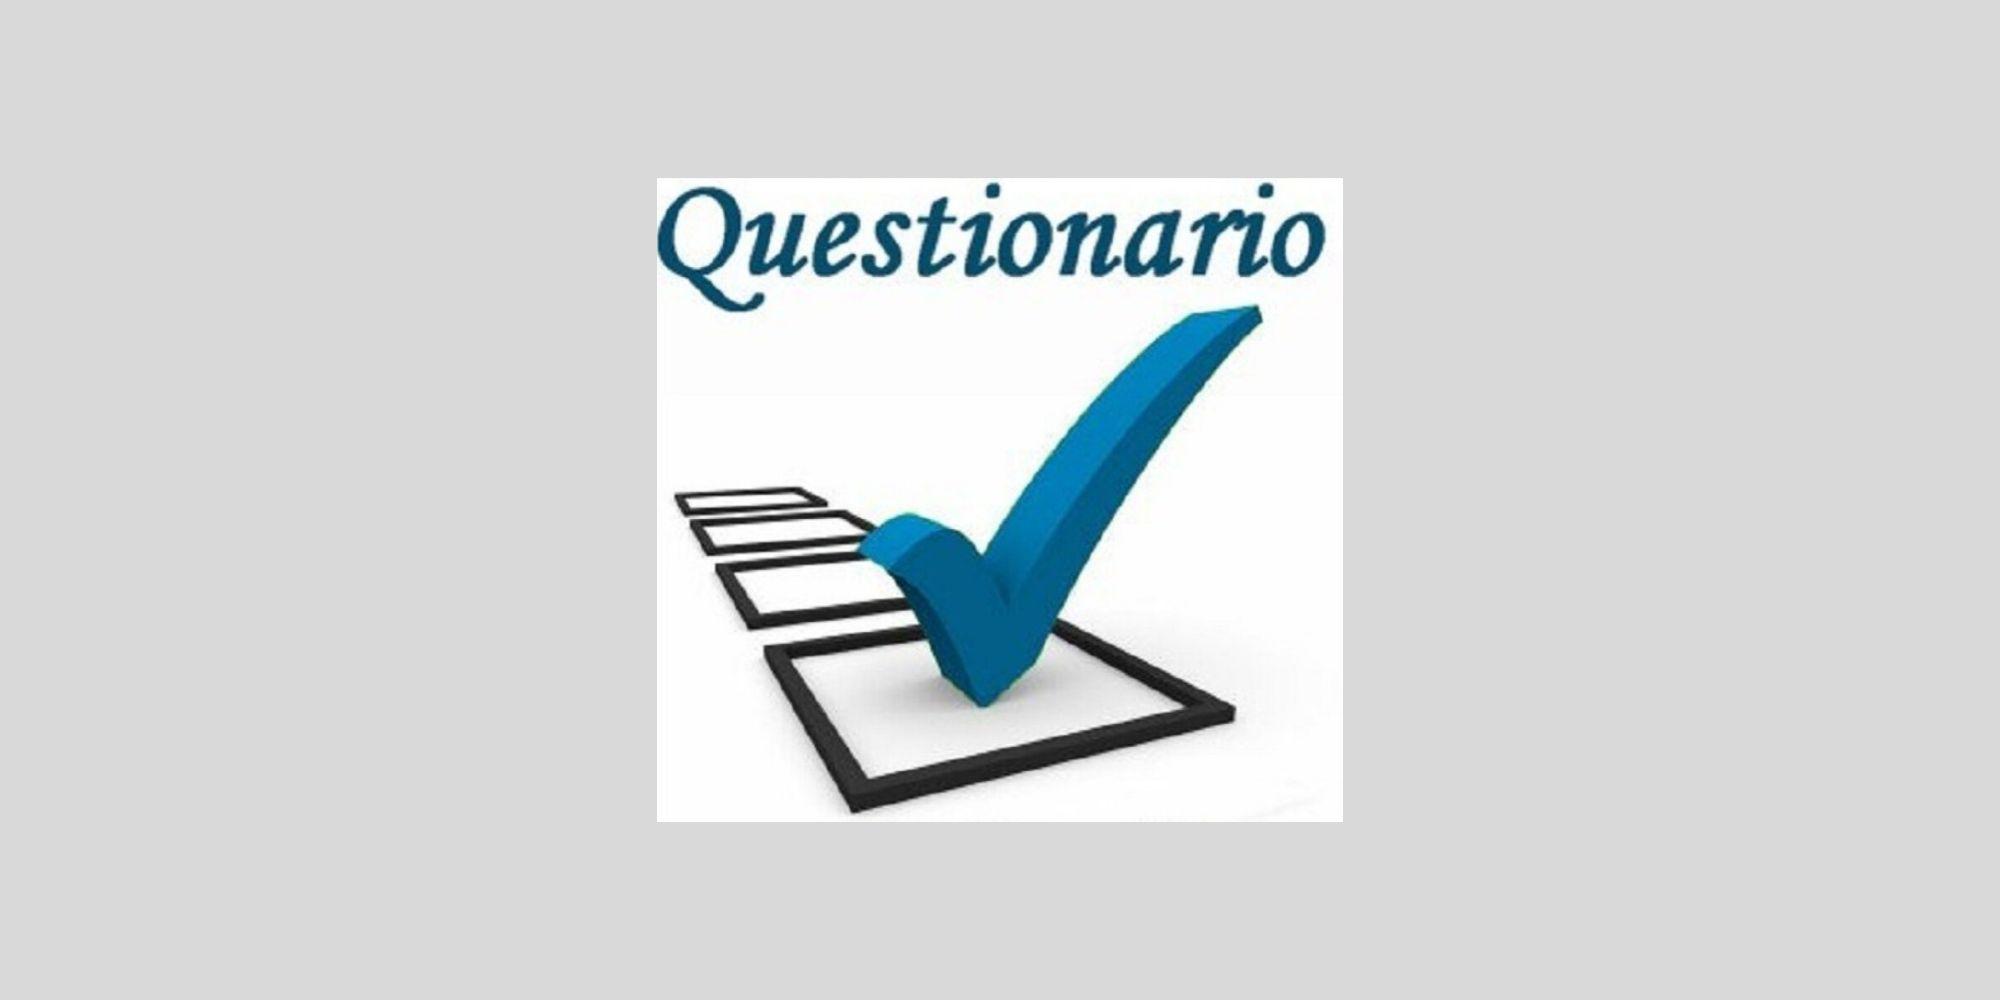 questionario-canva2000x1000.jpg